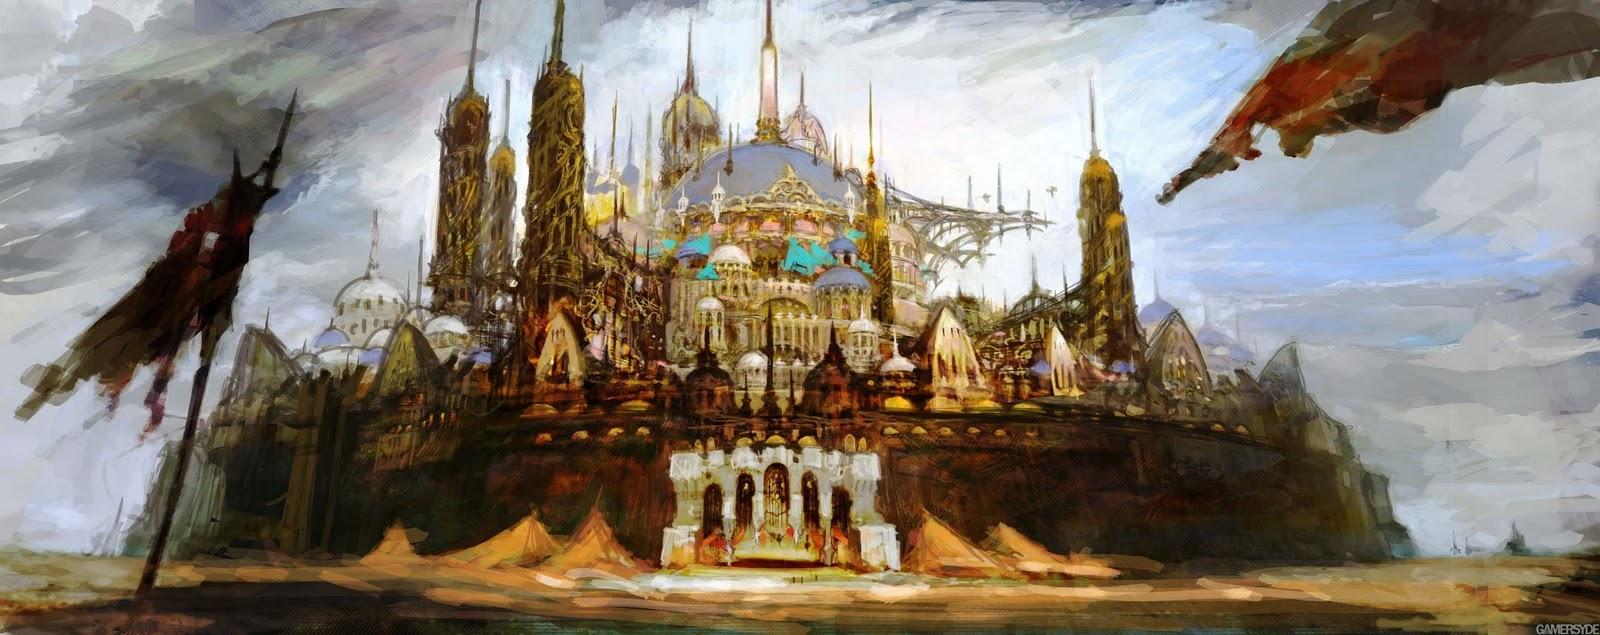 Final Fantasy Hd Wallpaper Final Fantasy Xiv